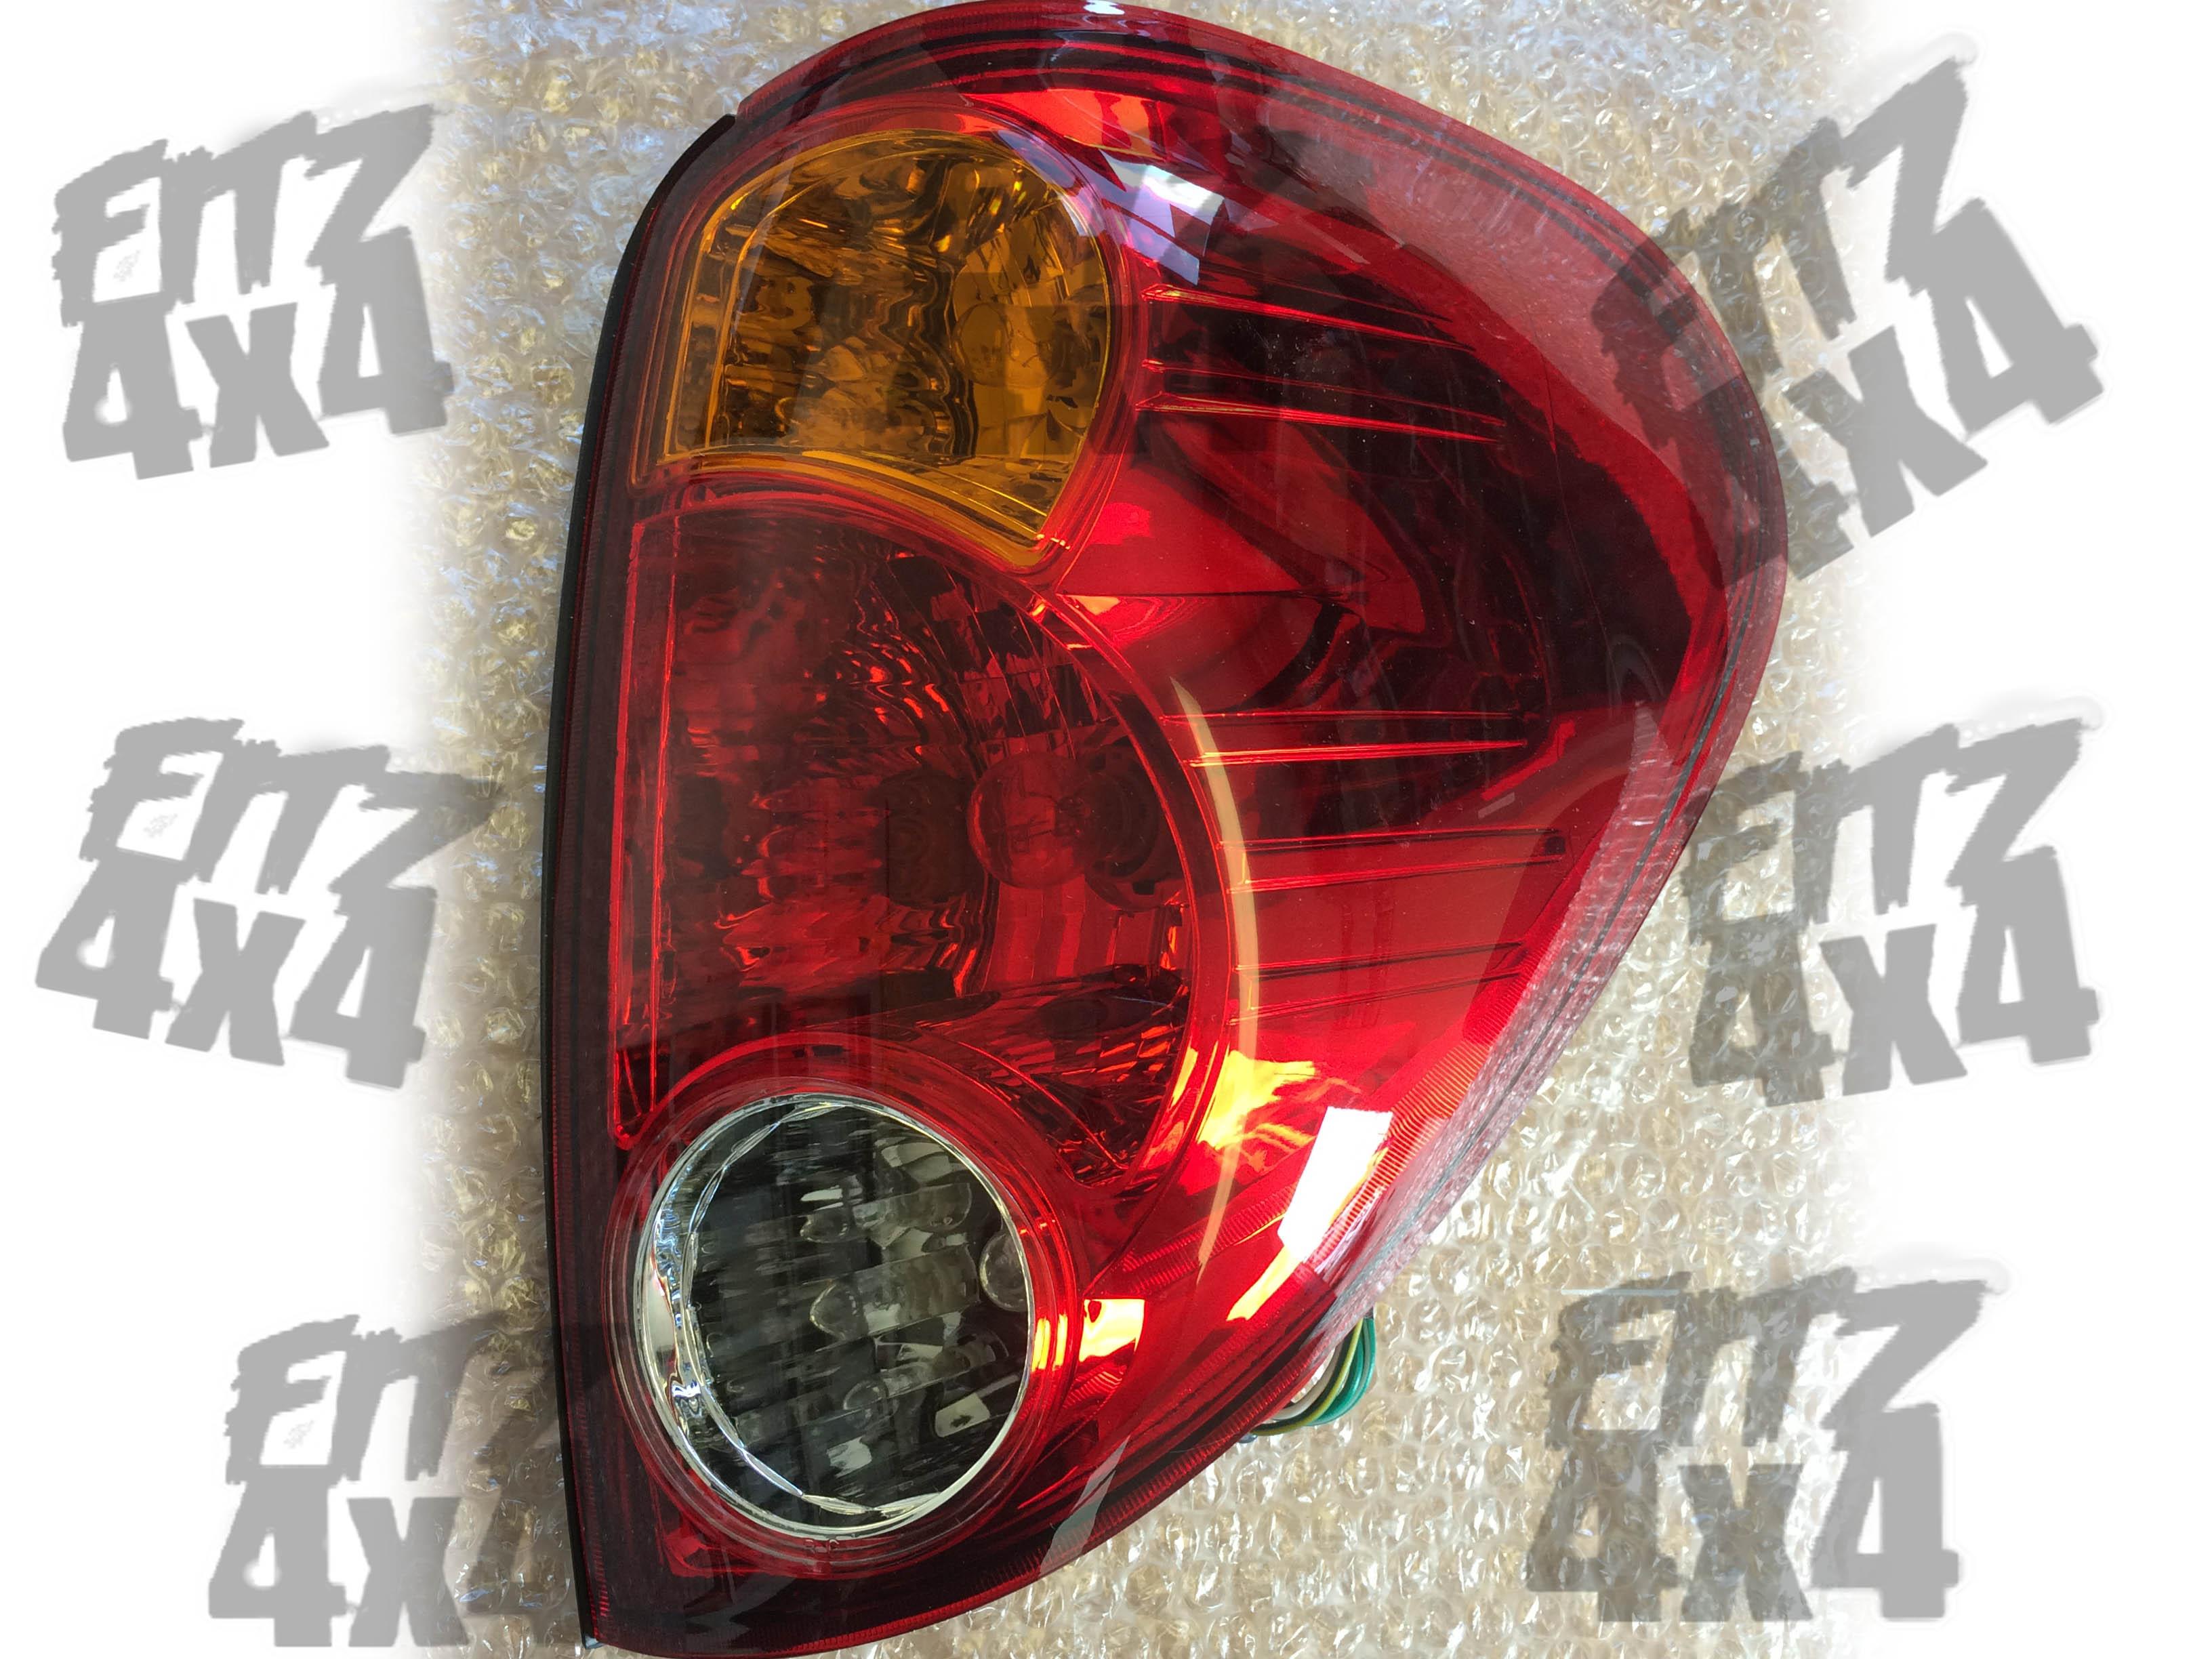 2006-2014 L200 rear right tail light